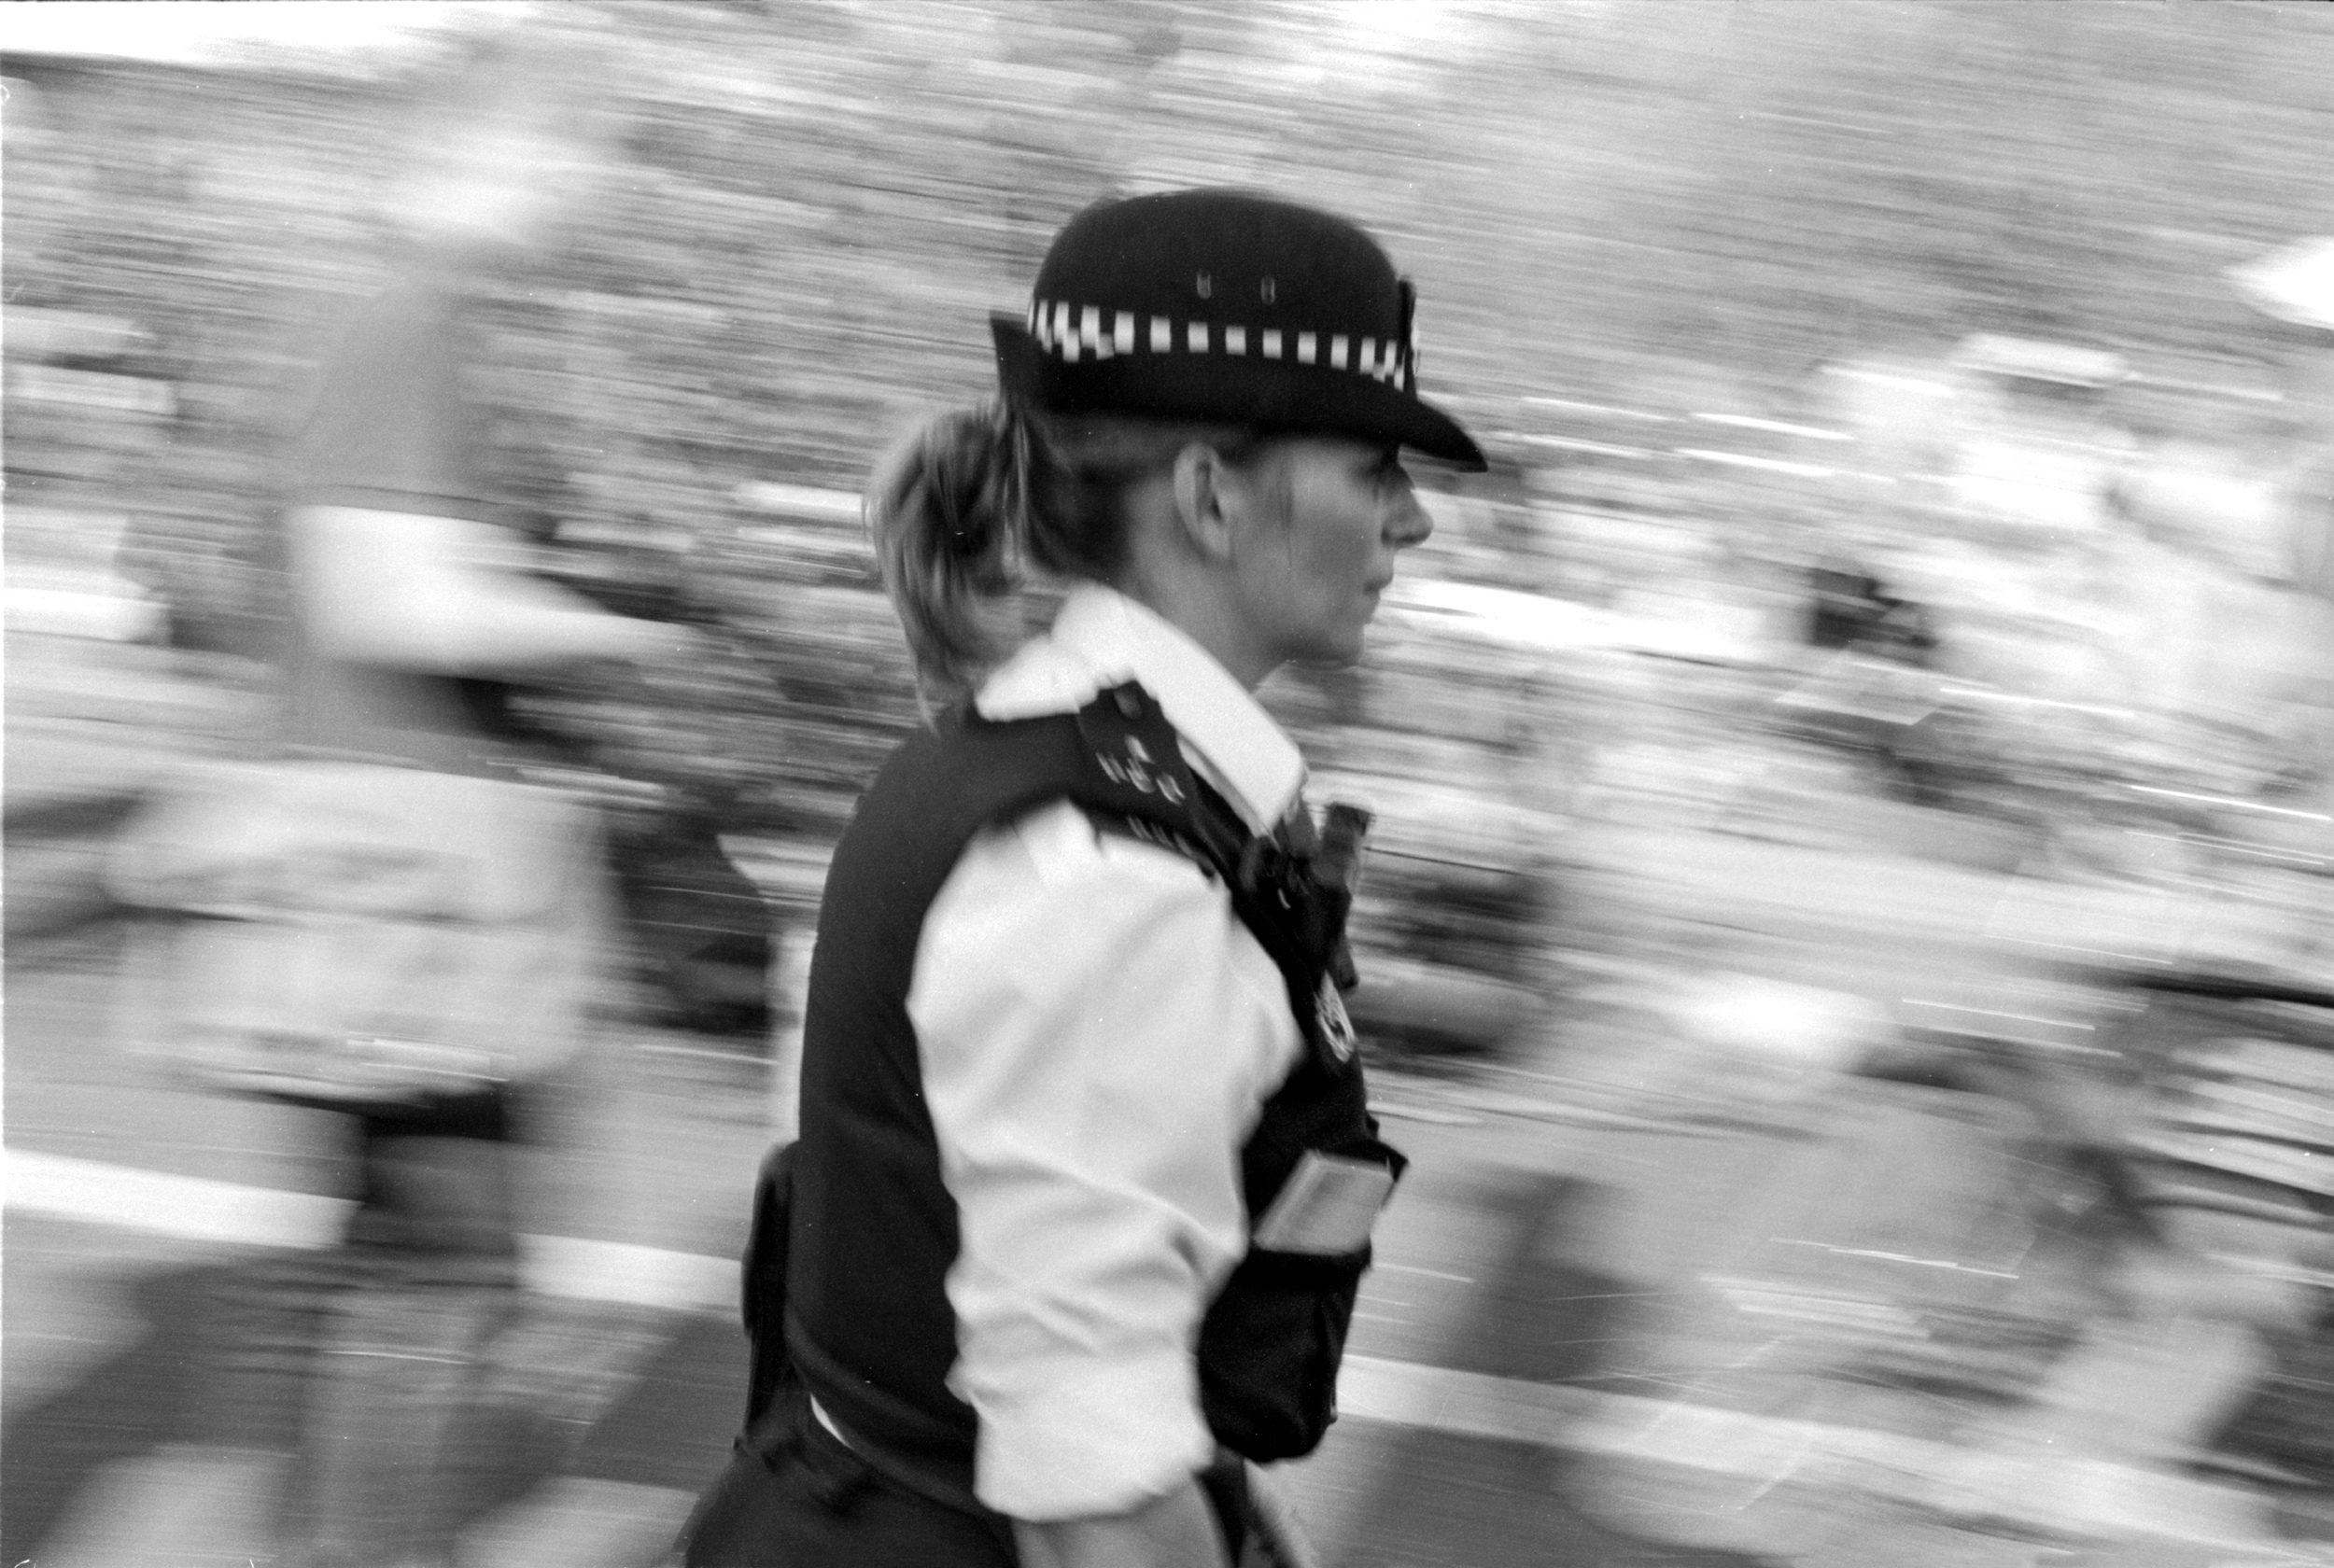 Photojournalism shot on Delta film.